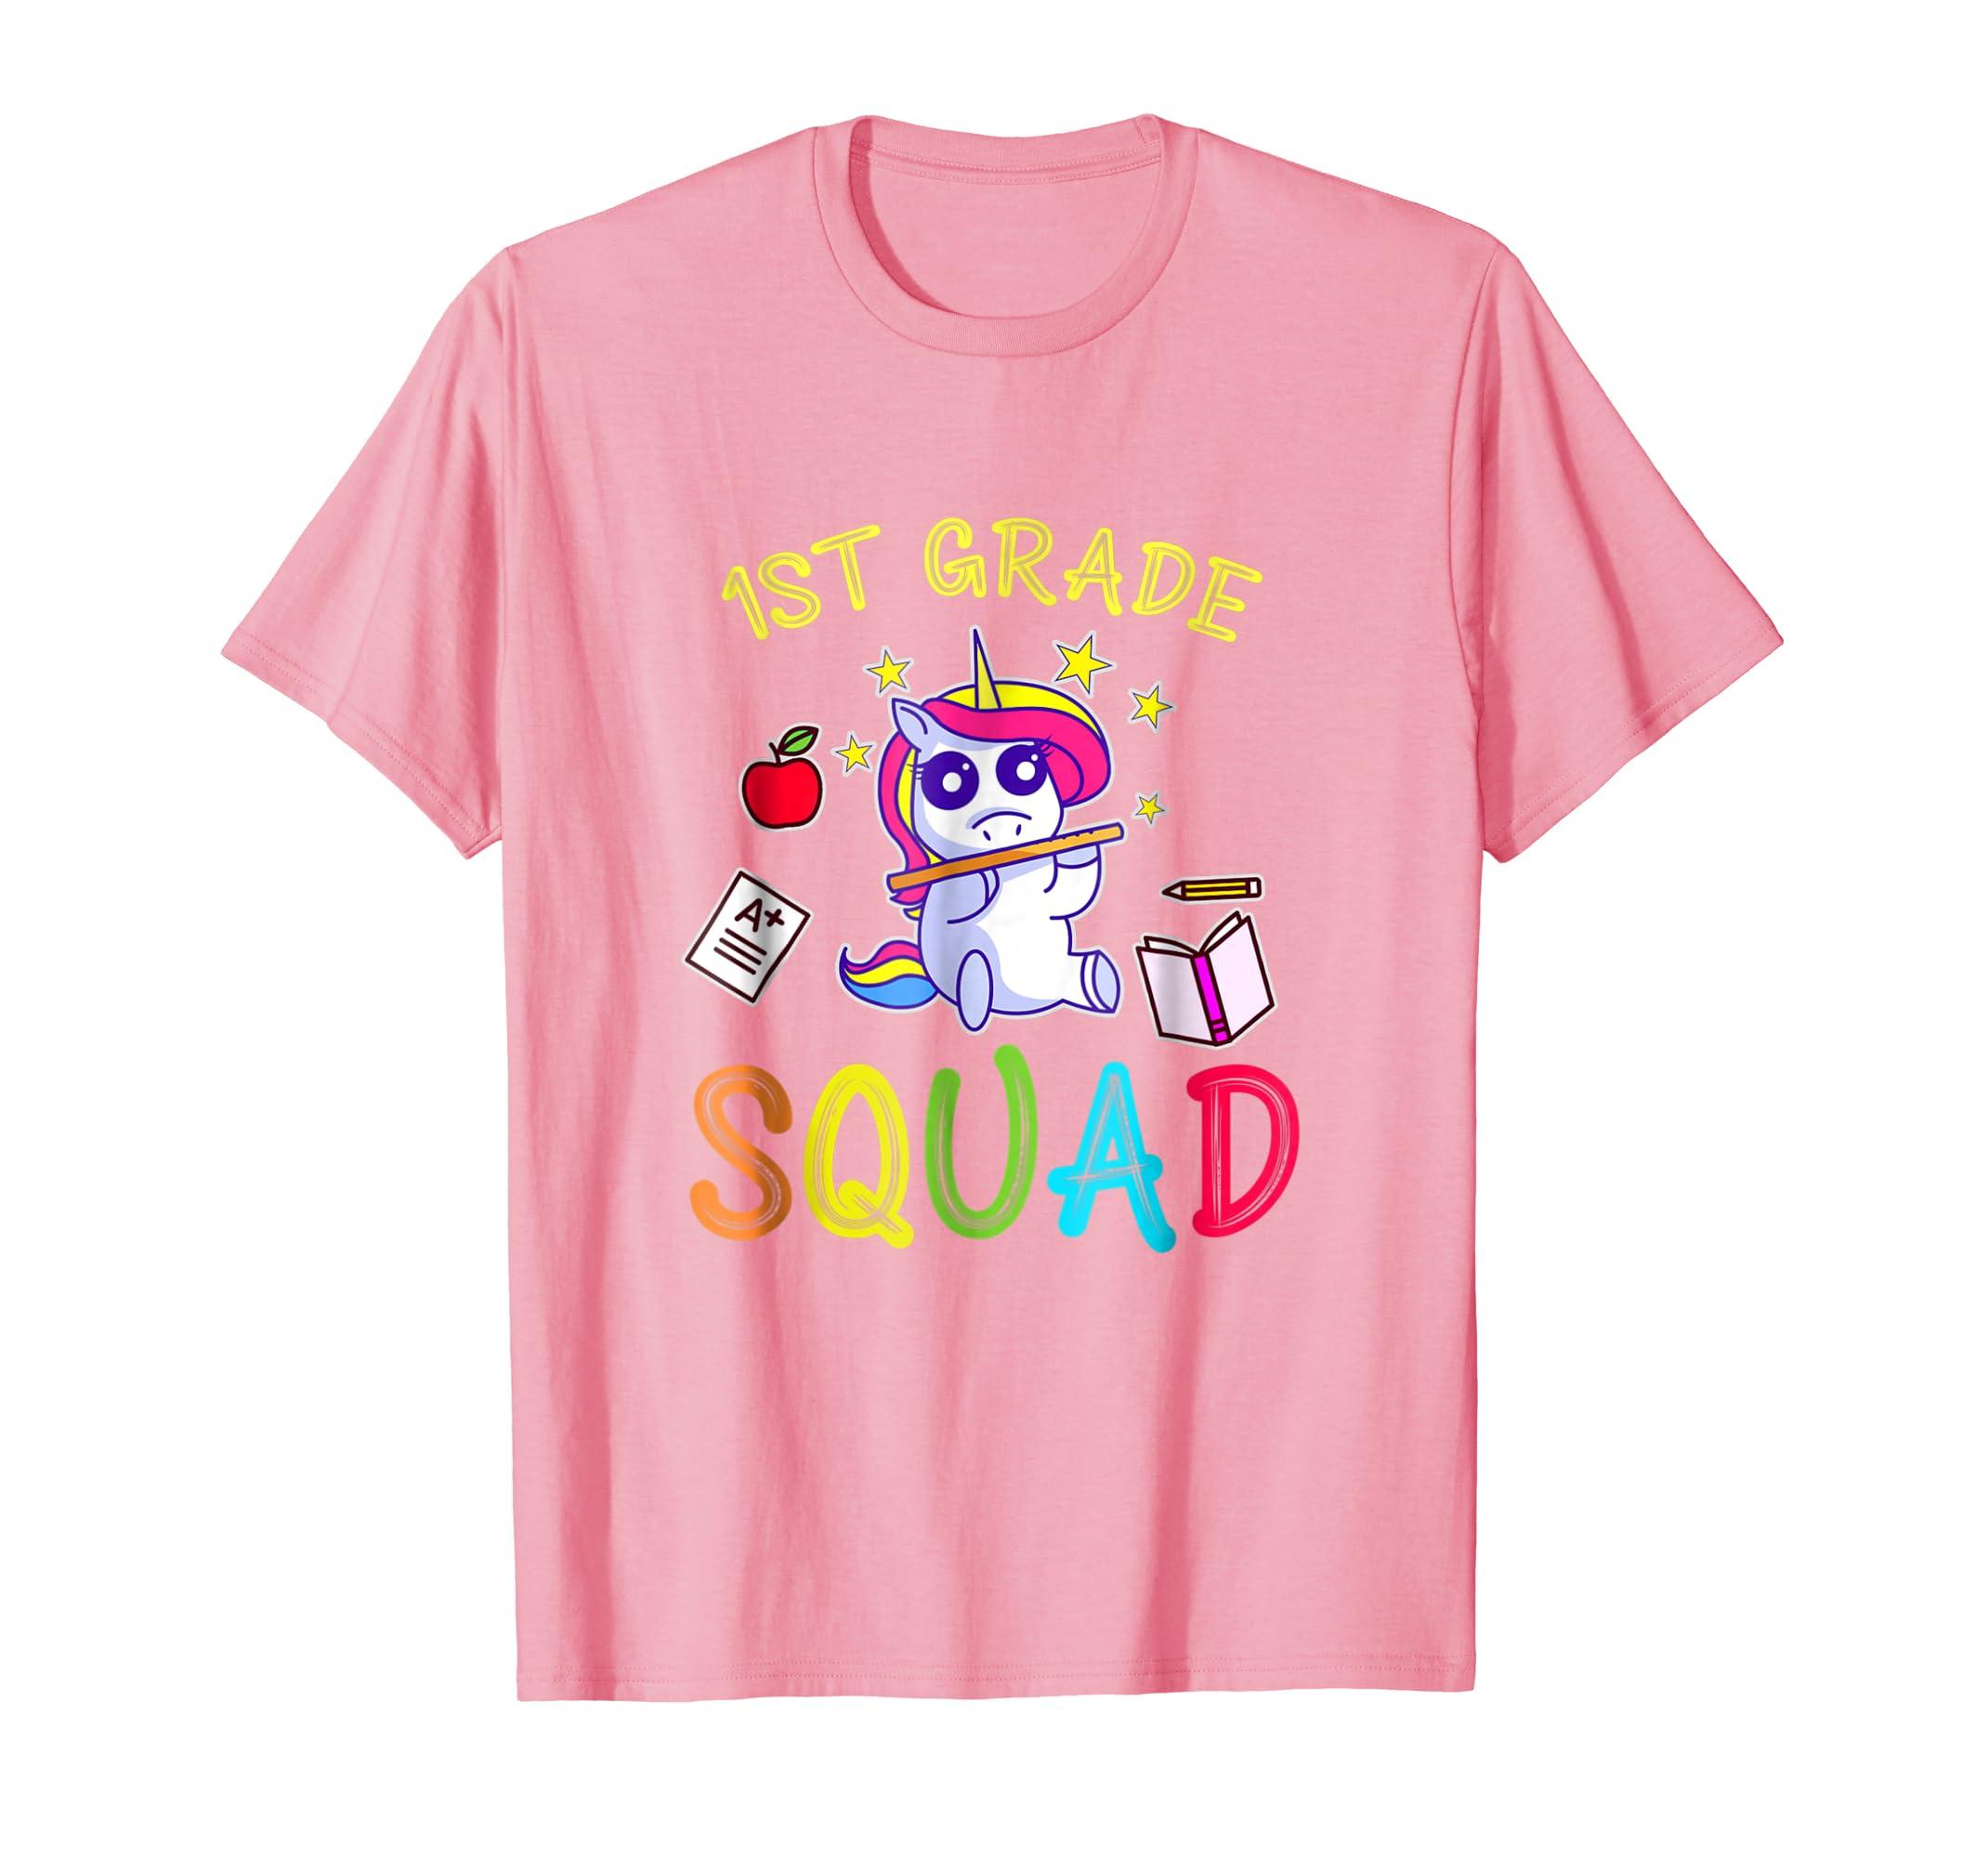 1st Grade squad teacher t shirt funny 1st day of school-Rose